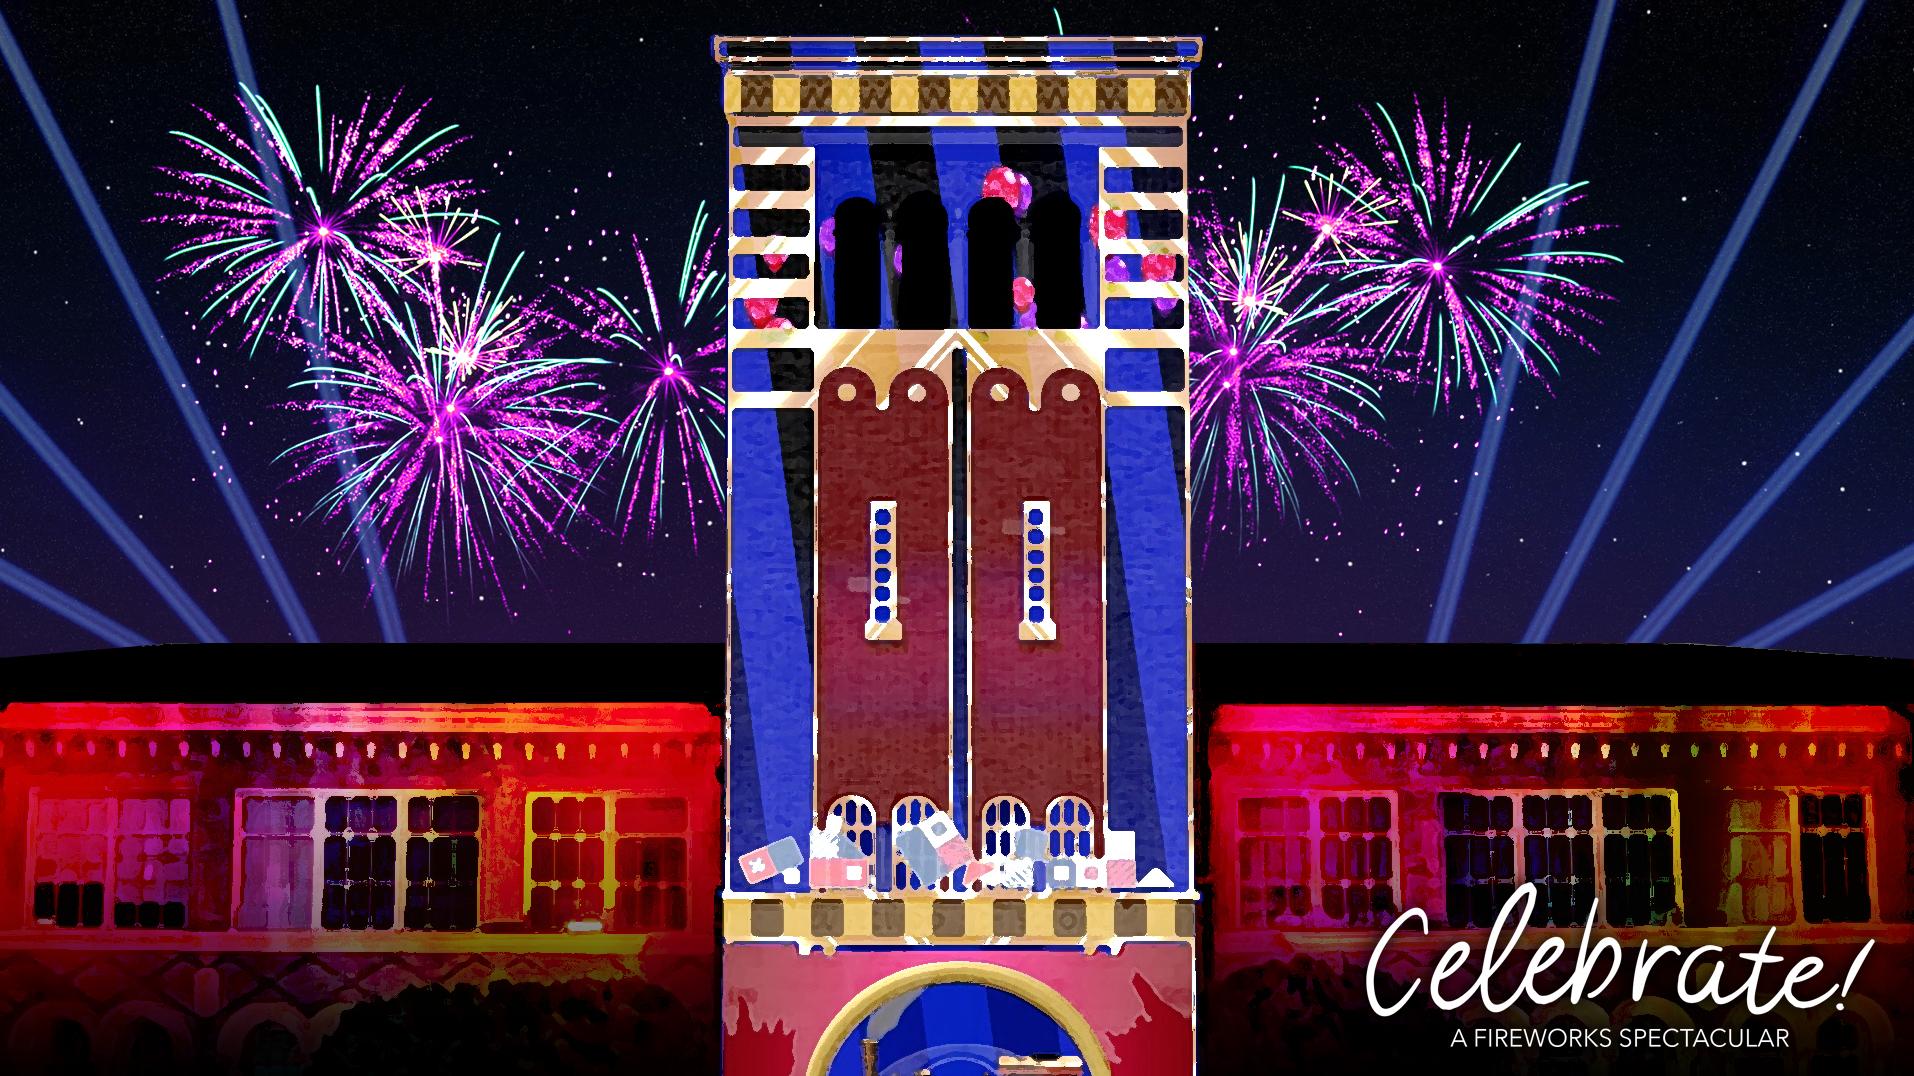 Celebrate! A Fireworks Spectacular